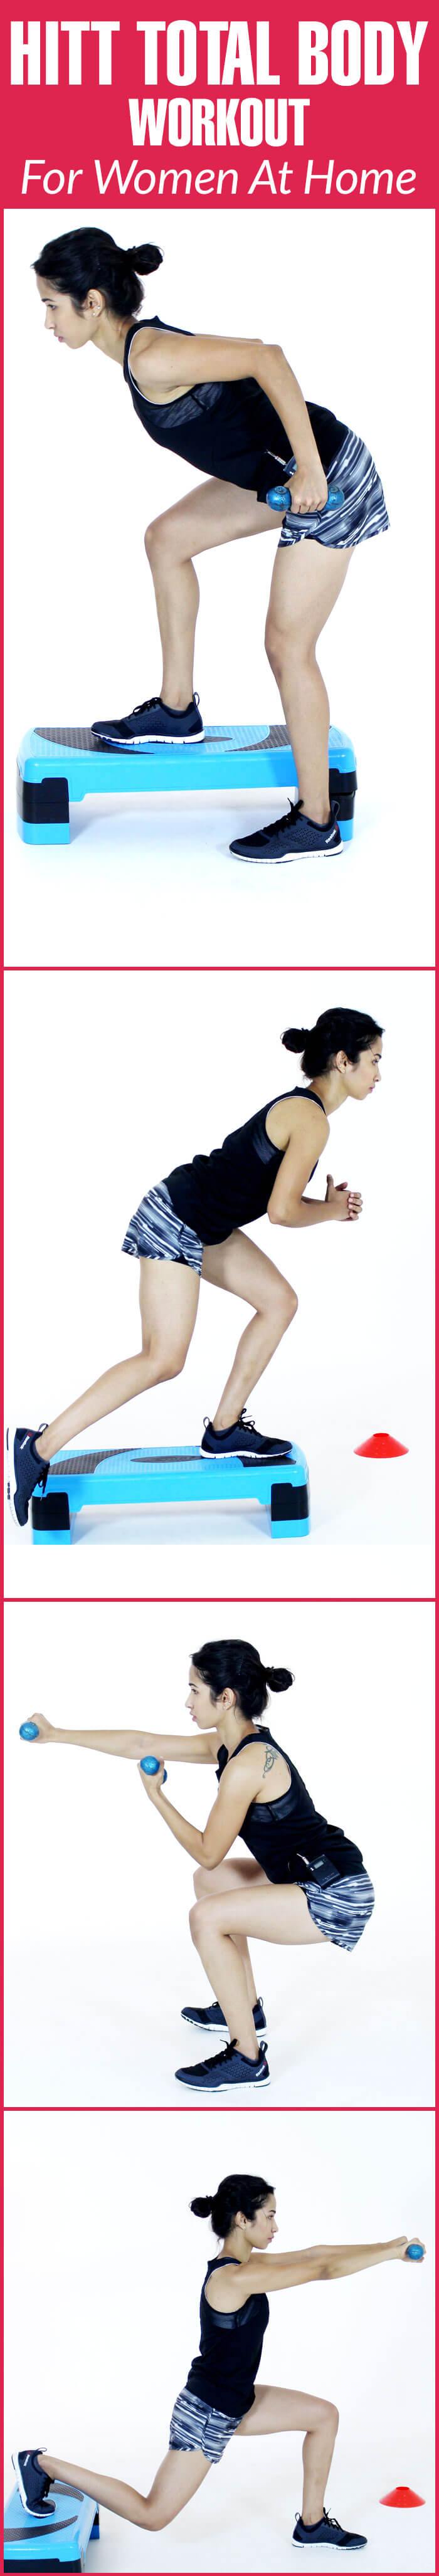 Full Body Workout For Women   Full Workout Plan